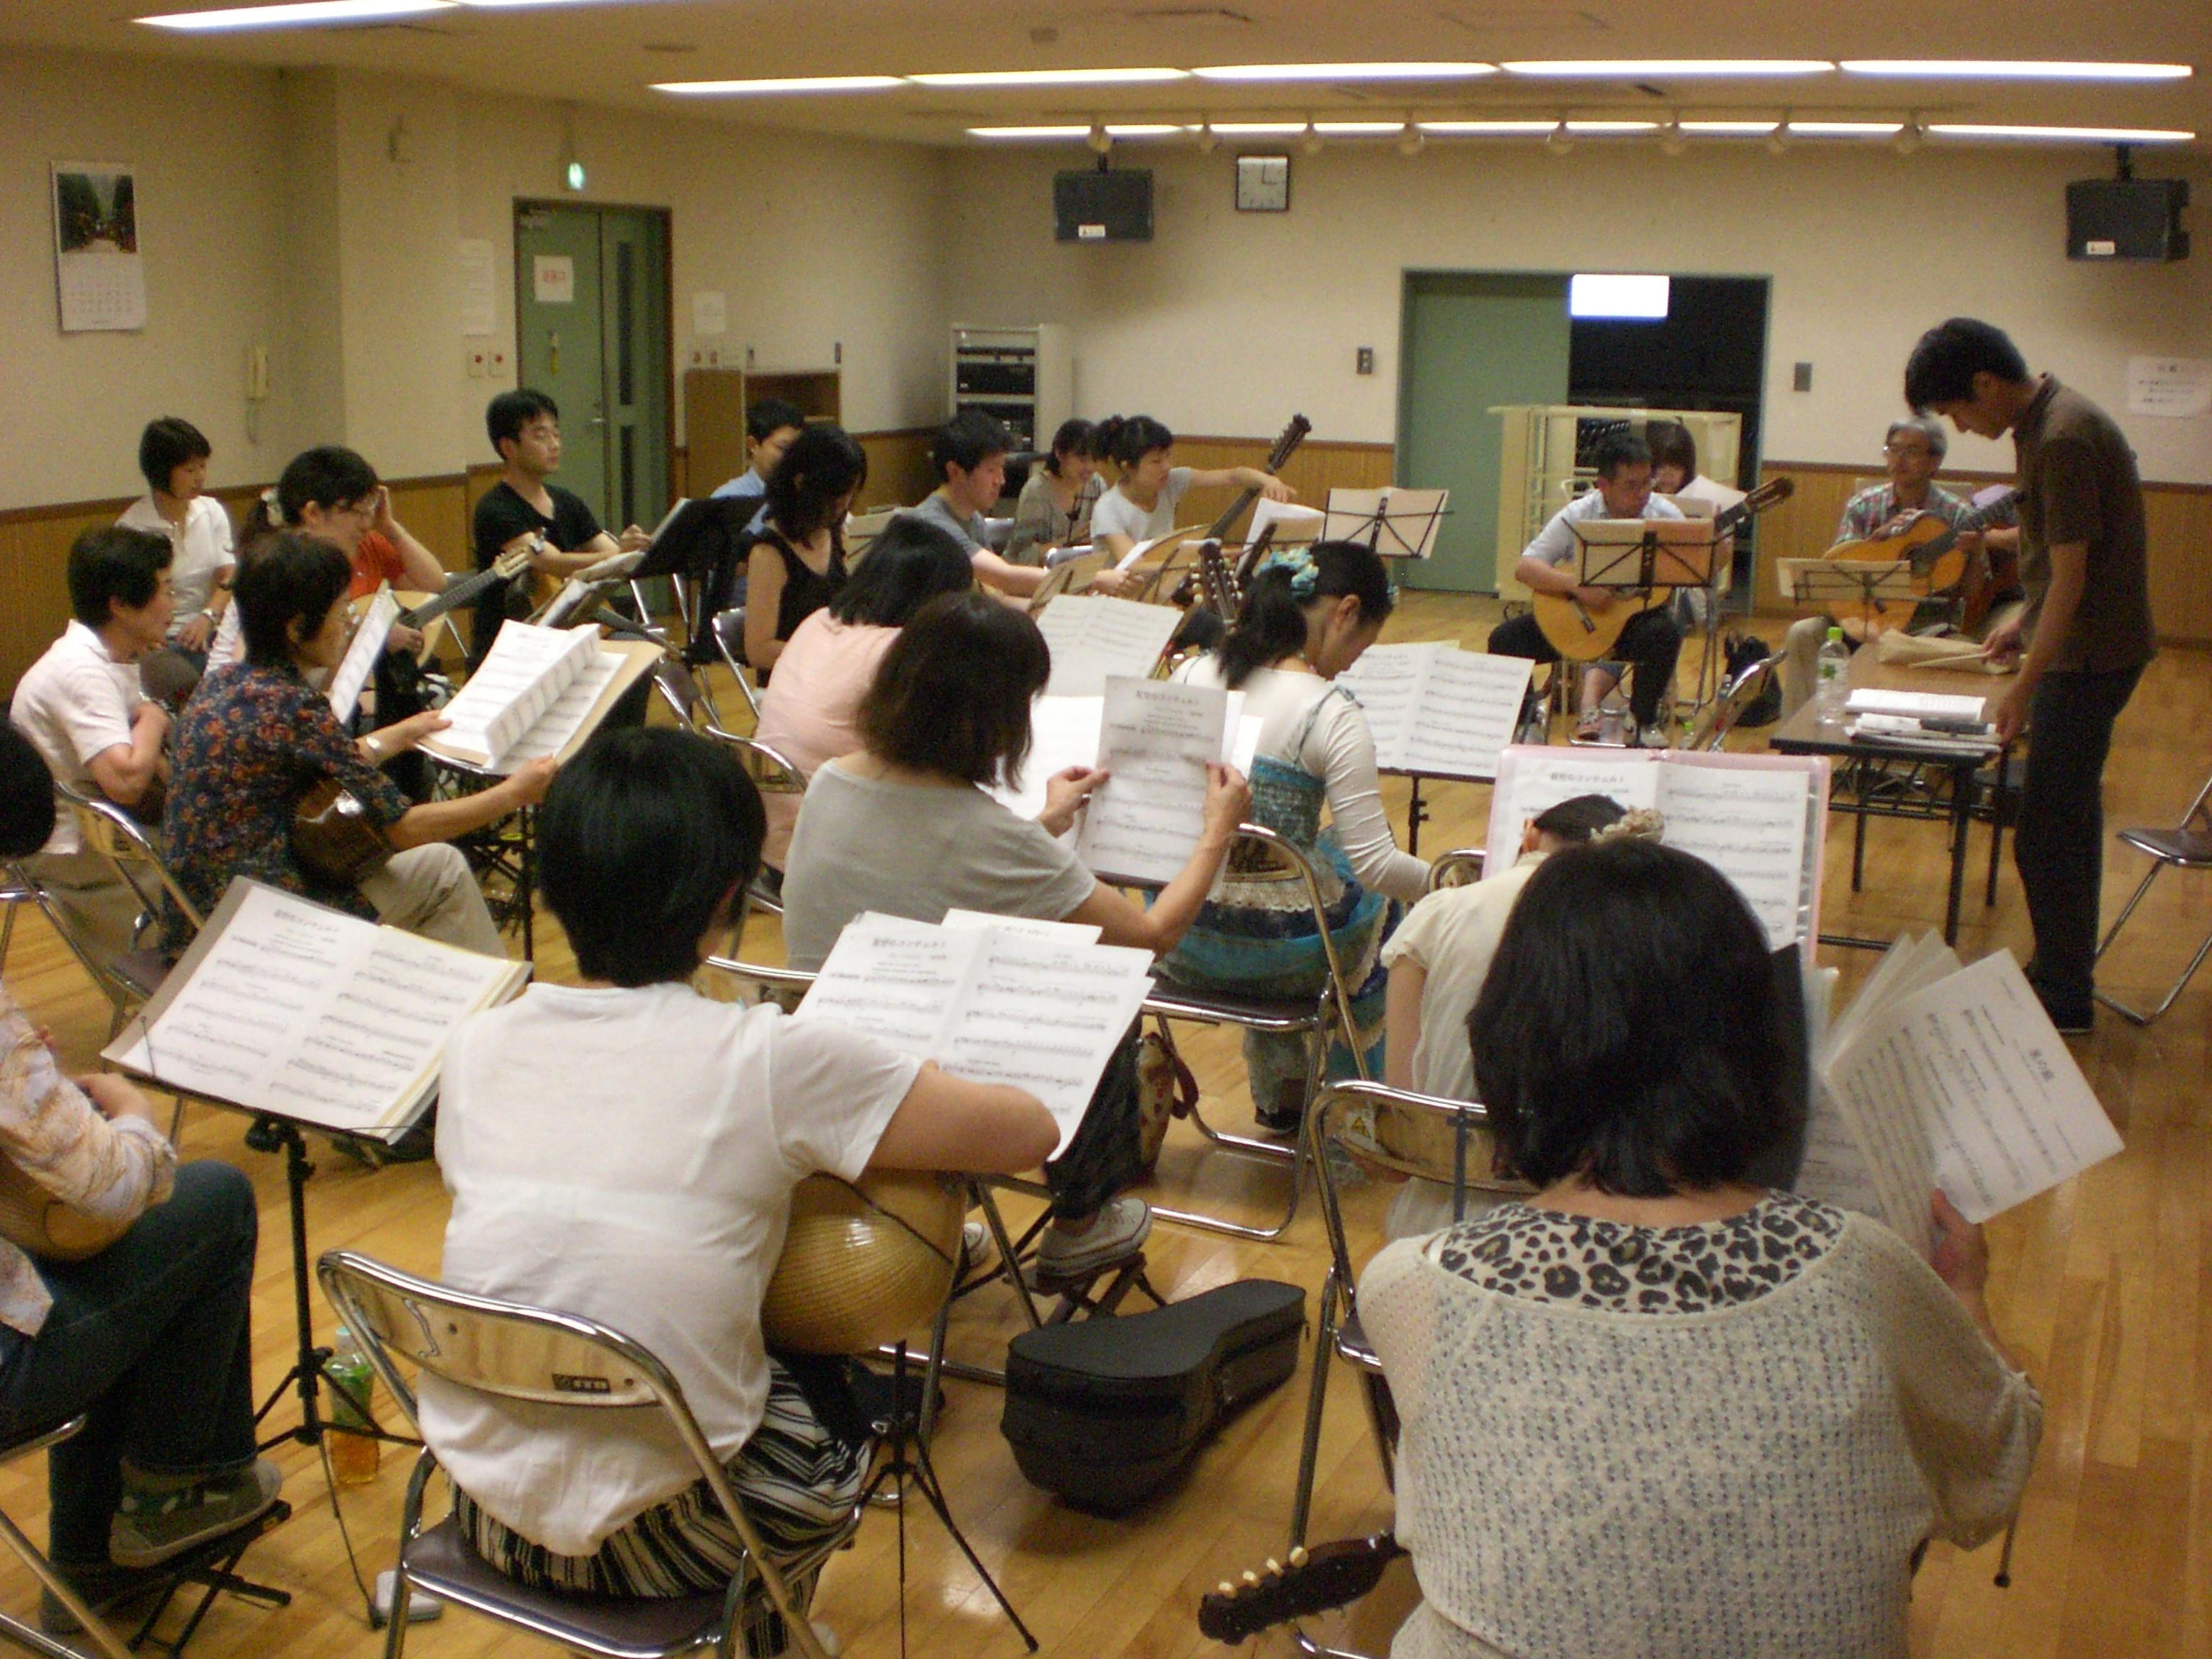 http://niizamandolinclub.jp/blog/CIMG1954.JPG